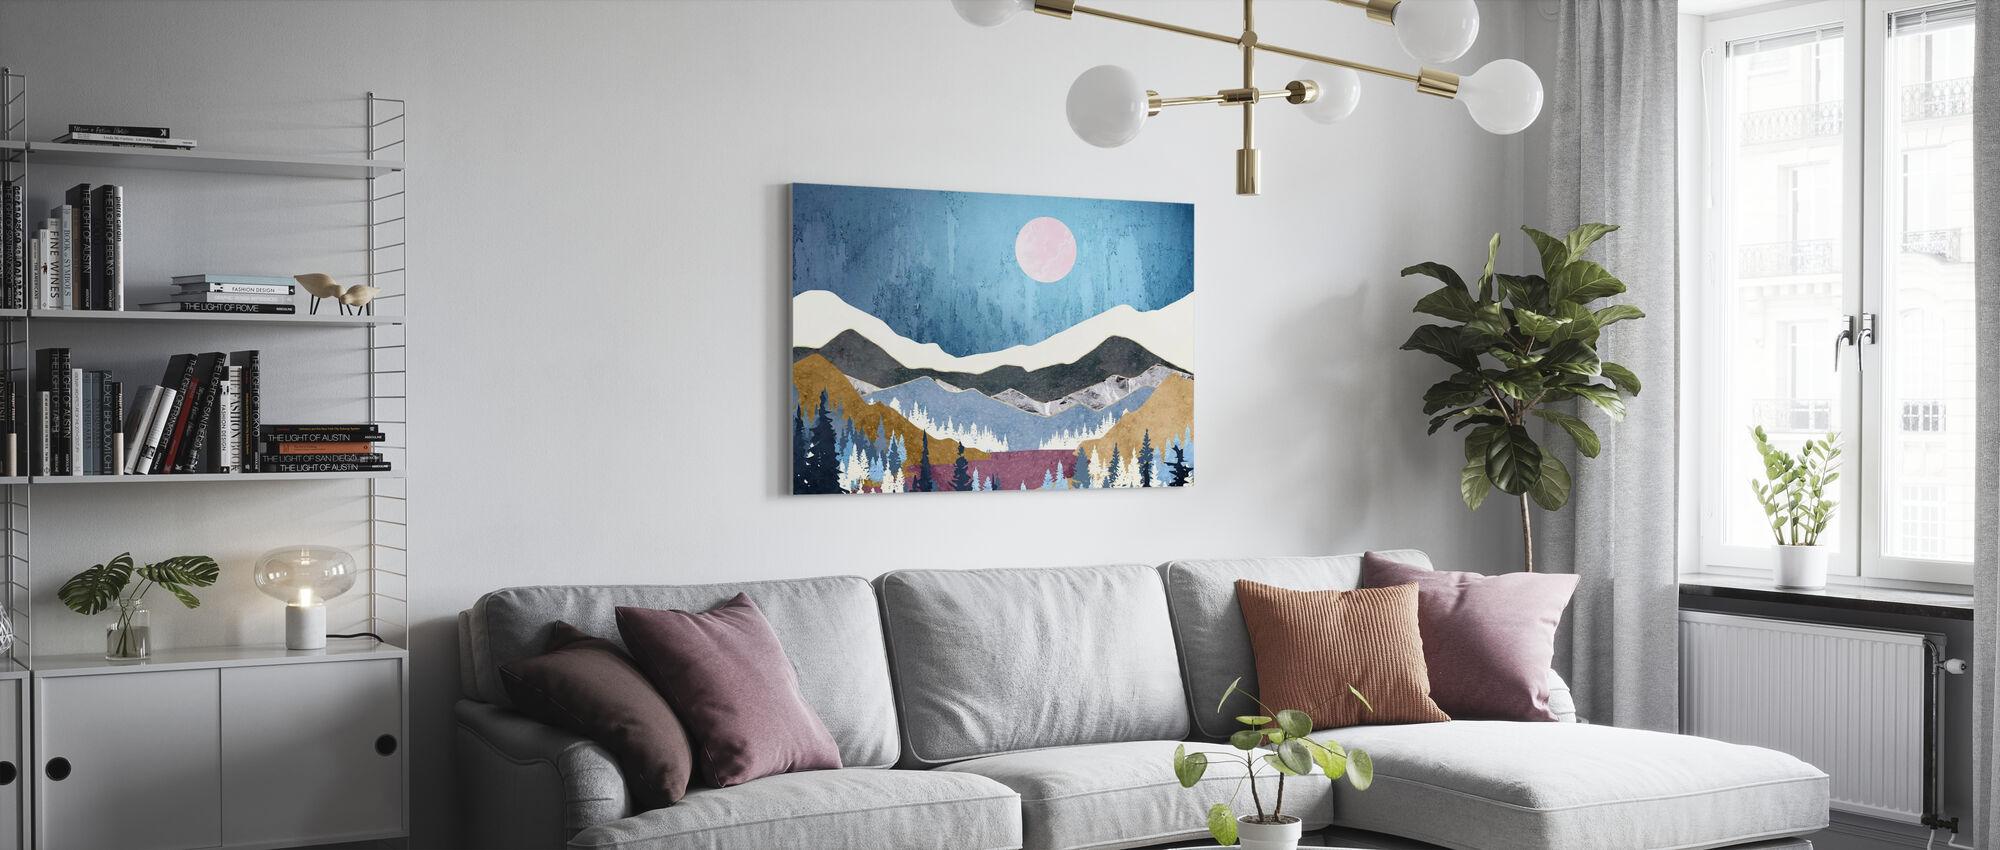 Blueberry Sky - Canvas print - Living Room